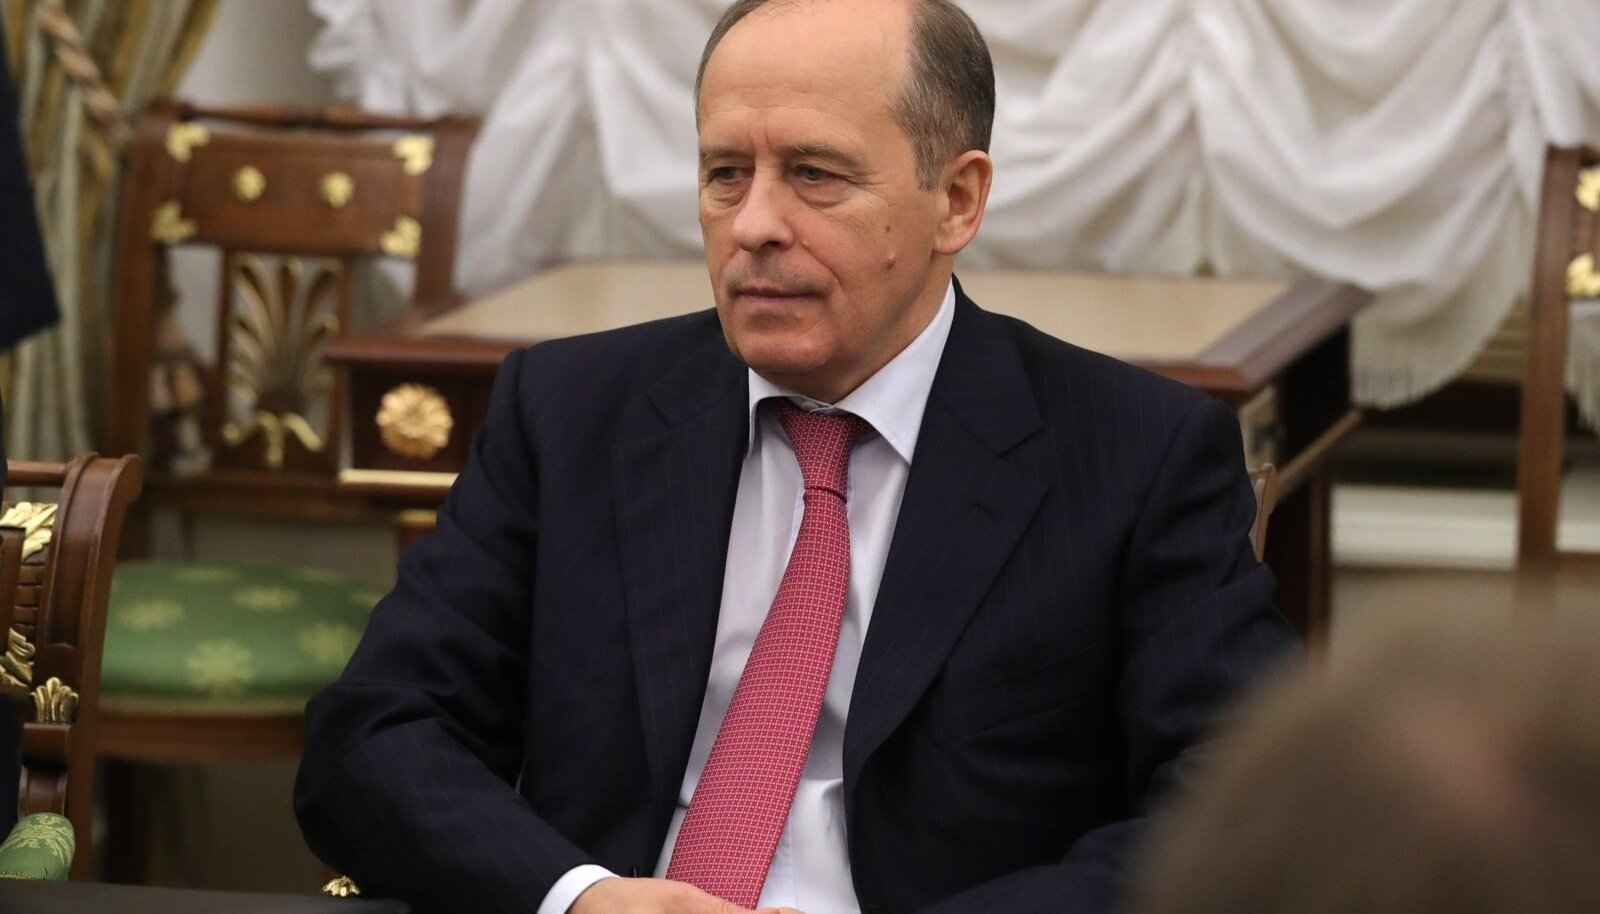 Aleksandr Bortnikov